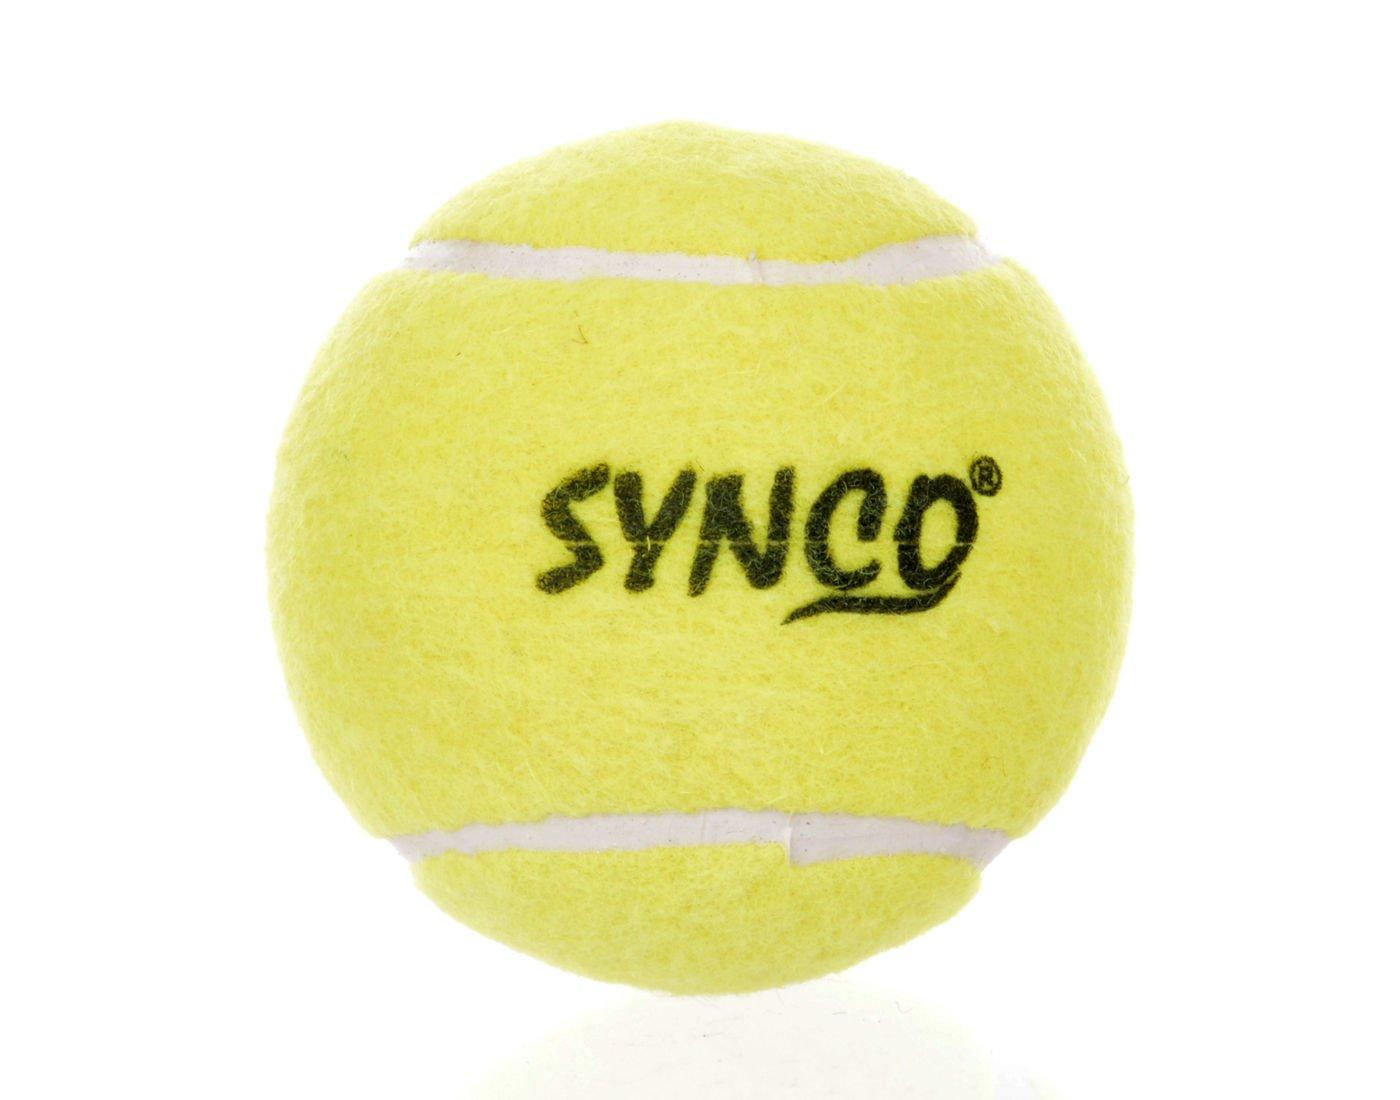 61j2YH6DhjL._SL1400_ Synco Tennis Ball Pack of 4 Rs. 249 – Amazon